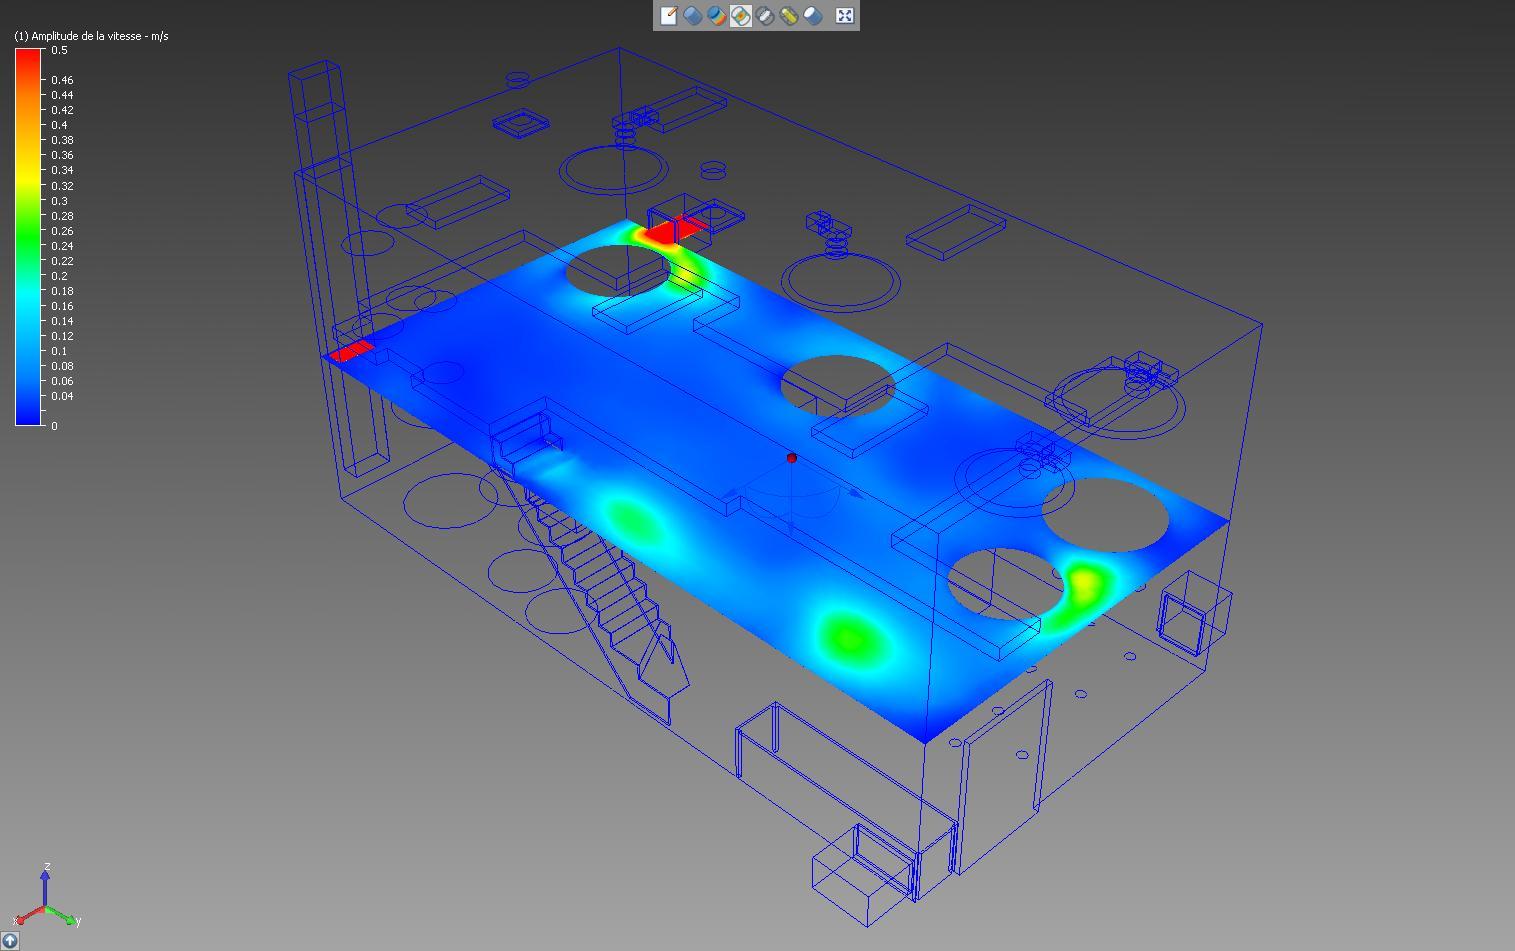 Modélisation Autodesk Simulation CFD